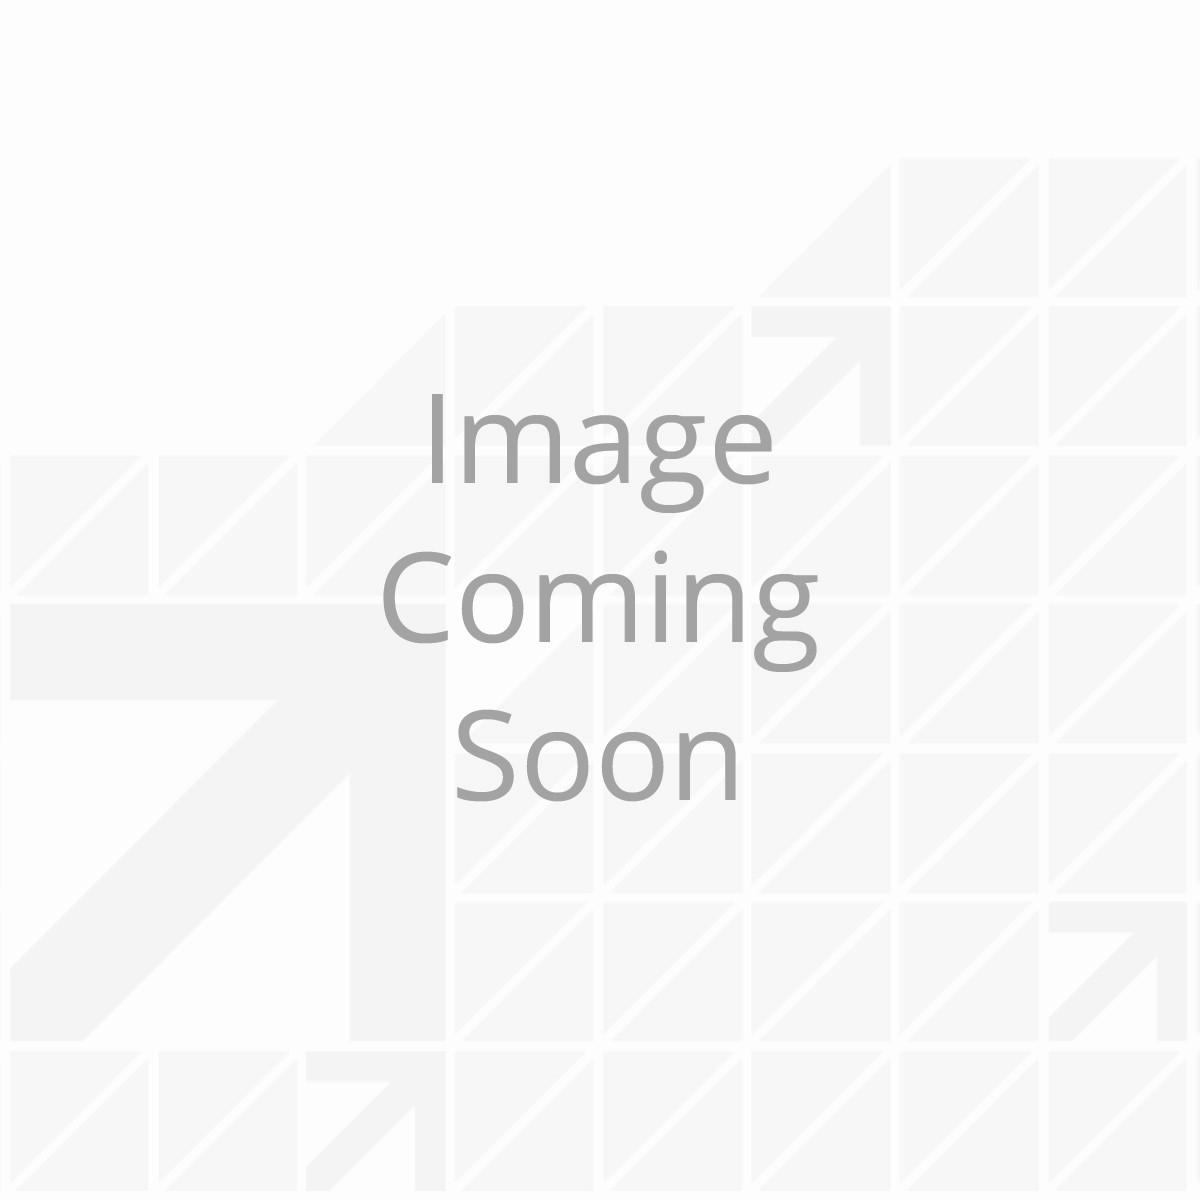 R& Door Spring  sc 1 st  Lippert Components & Lippert Components RV Parts and Accessories|RV Door Parts